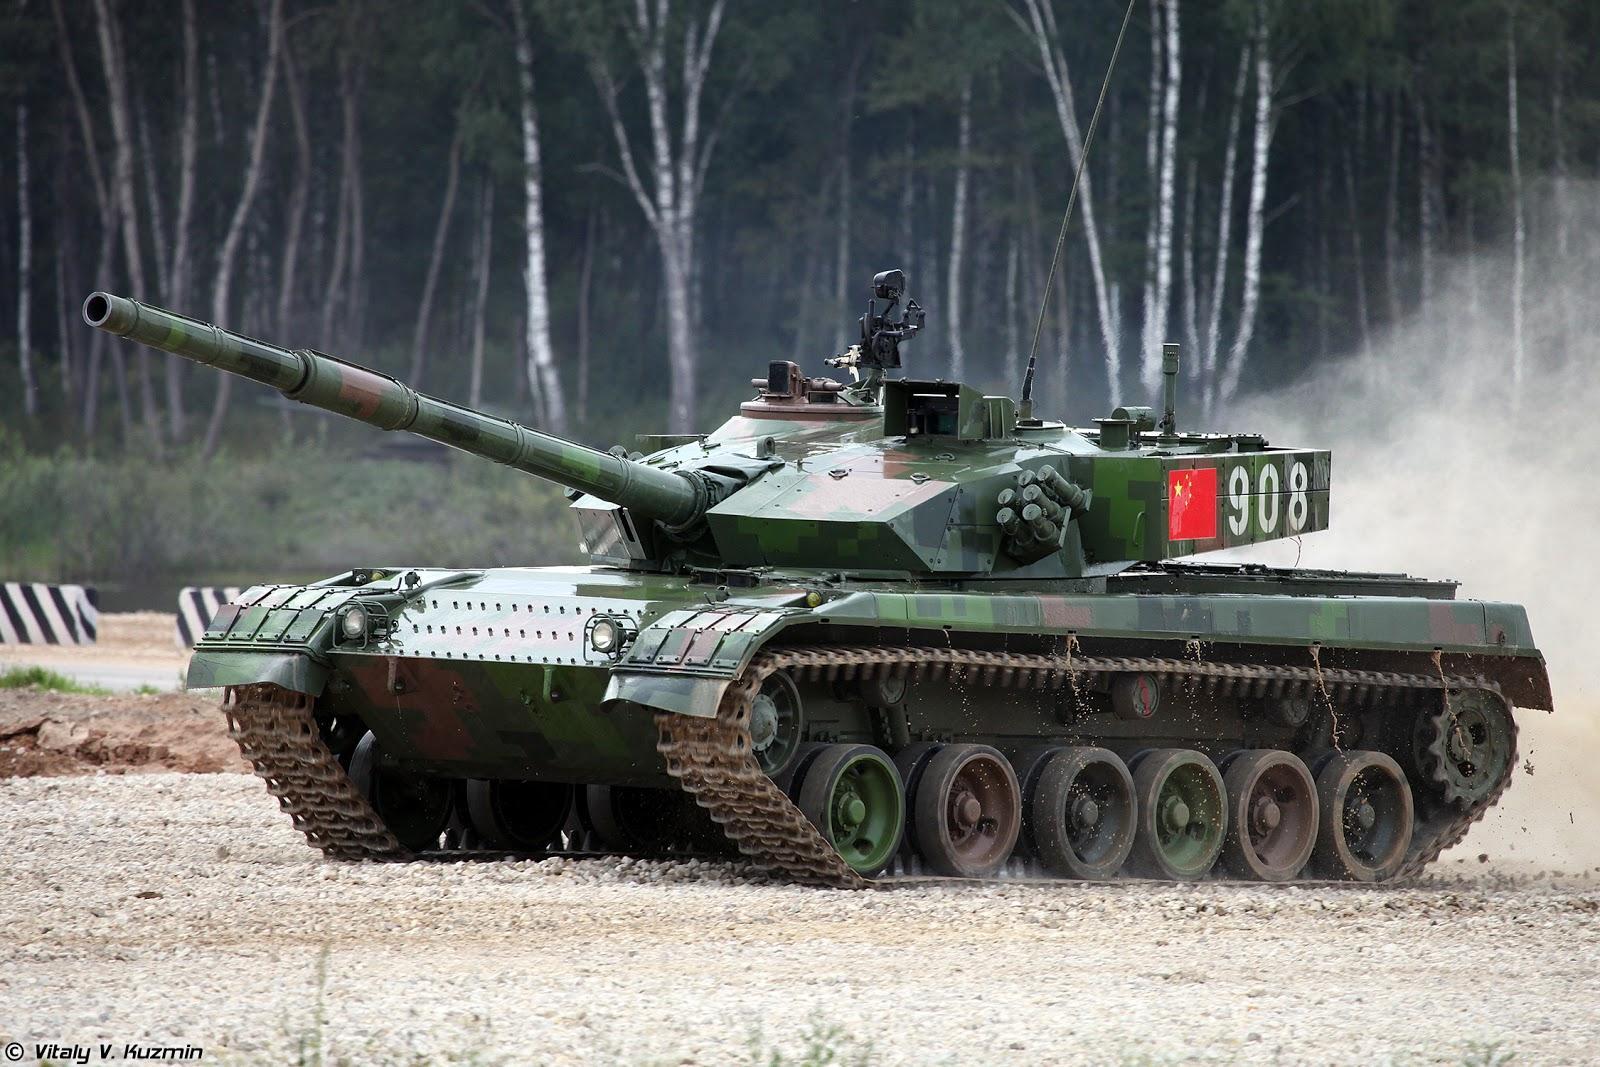 ��.�T_中国ztz-96型主战坦克的前三个字母代表什么意思?